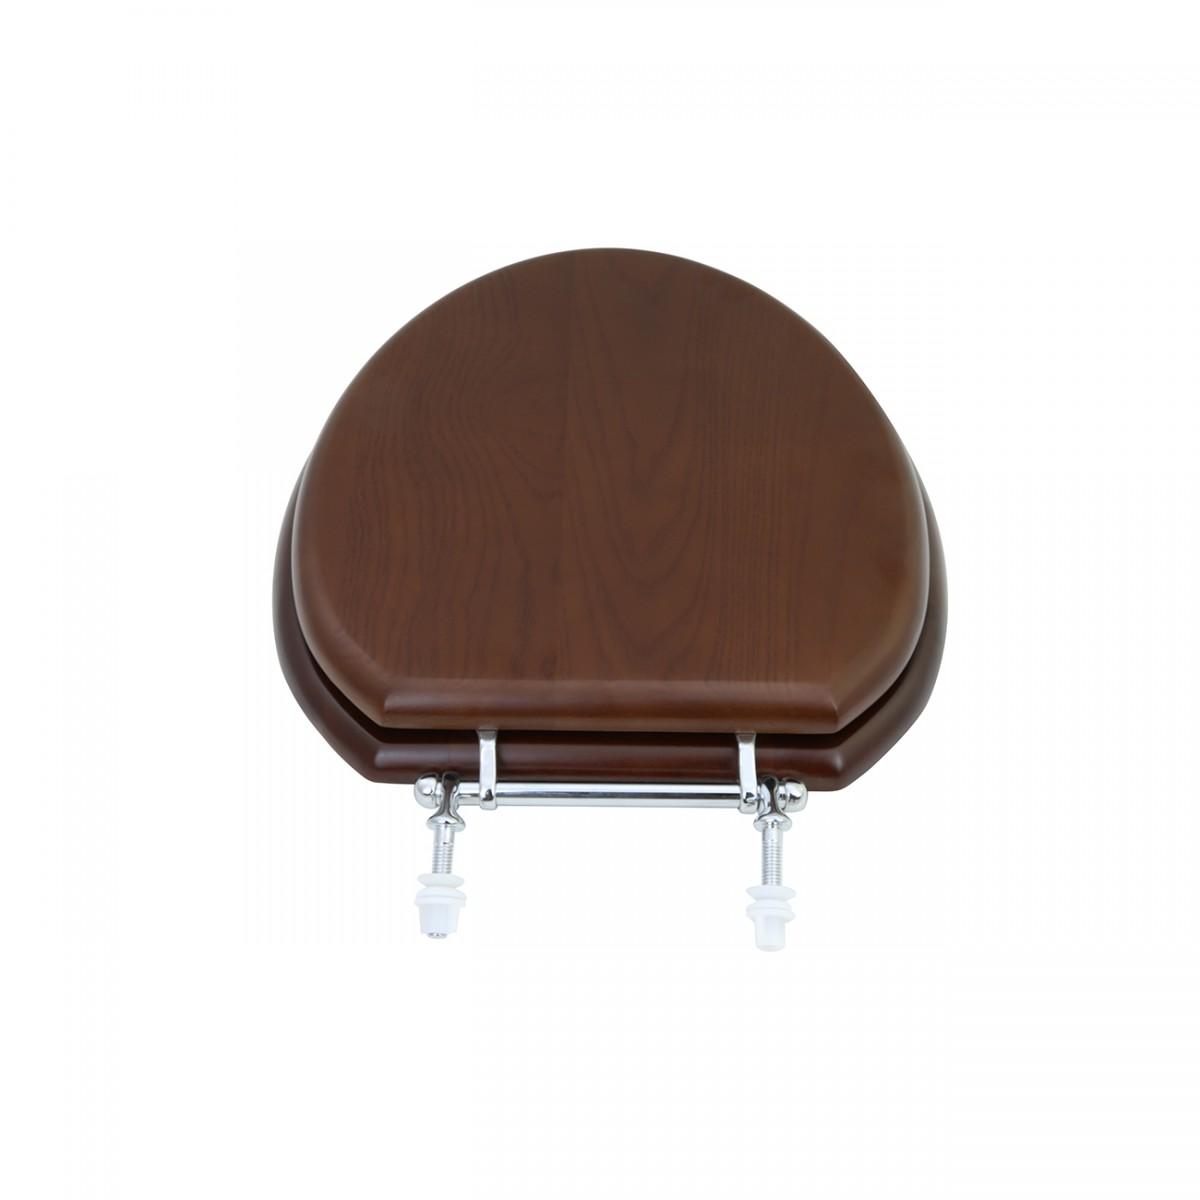 Elongated Toilet Seat Solid Wood Dark Oak Chrome Hinge toilet seat wooden toilet seat elongated toilet seat